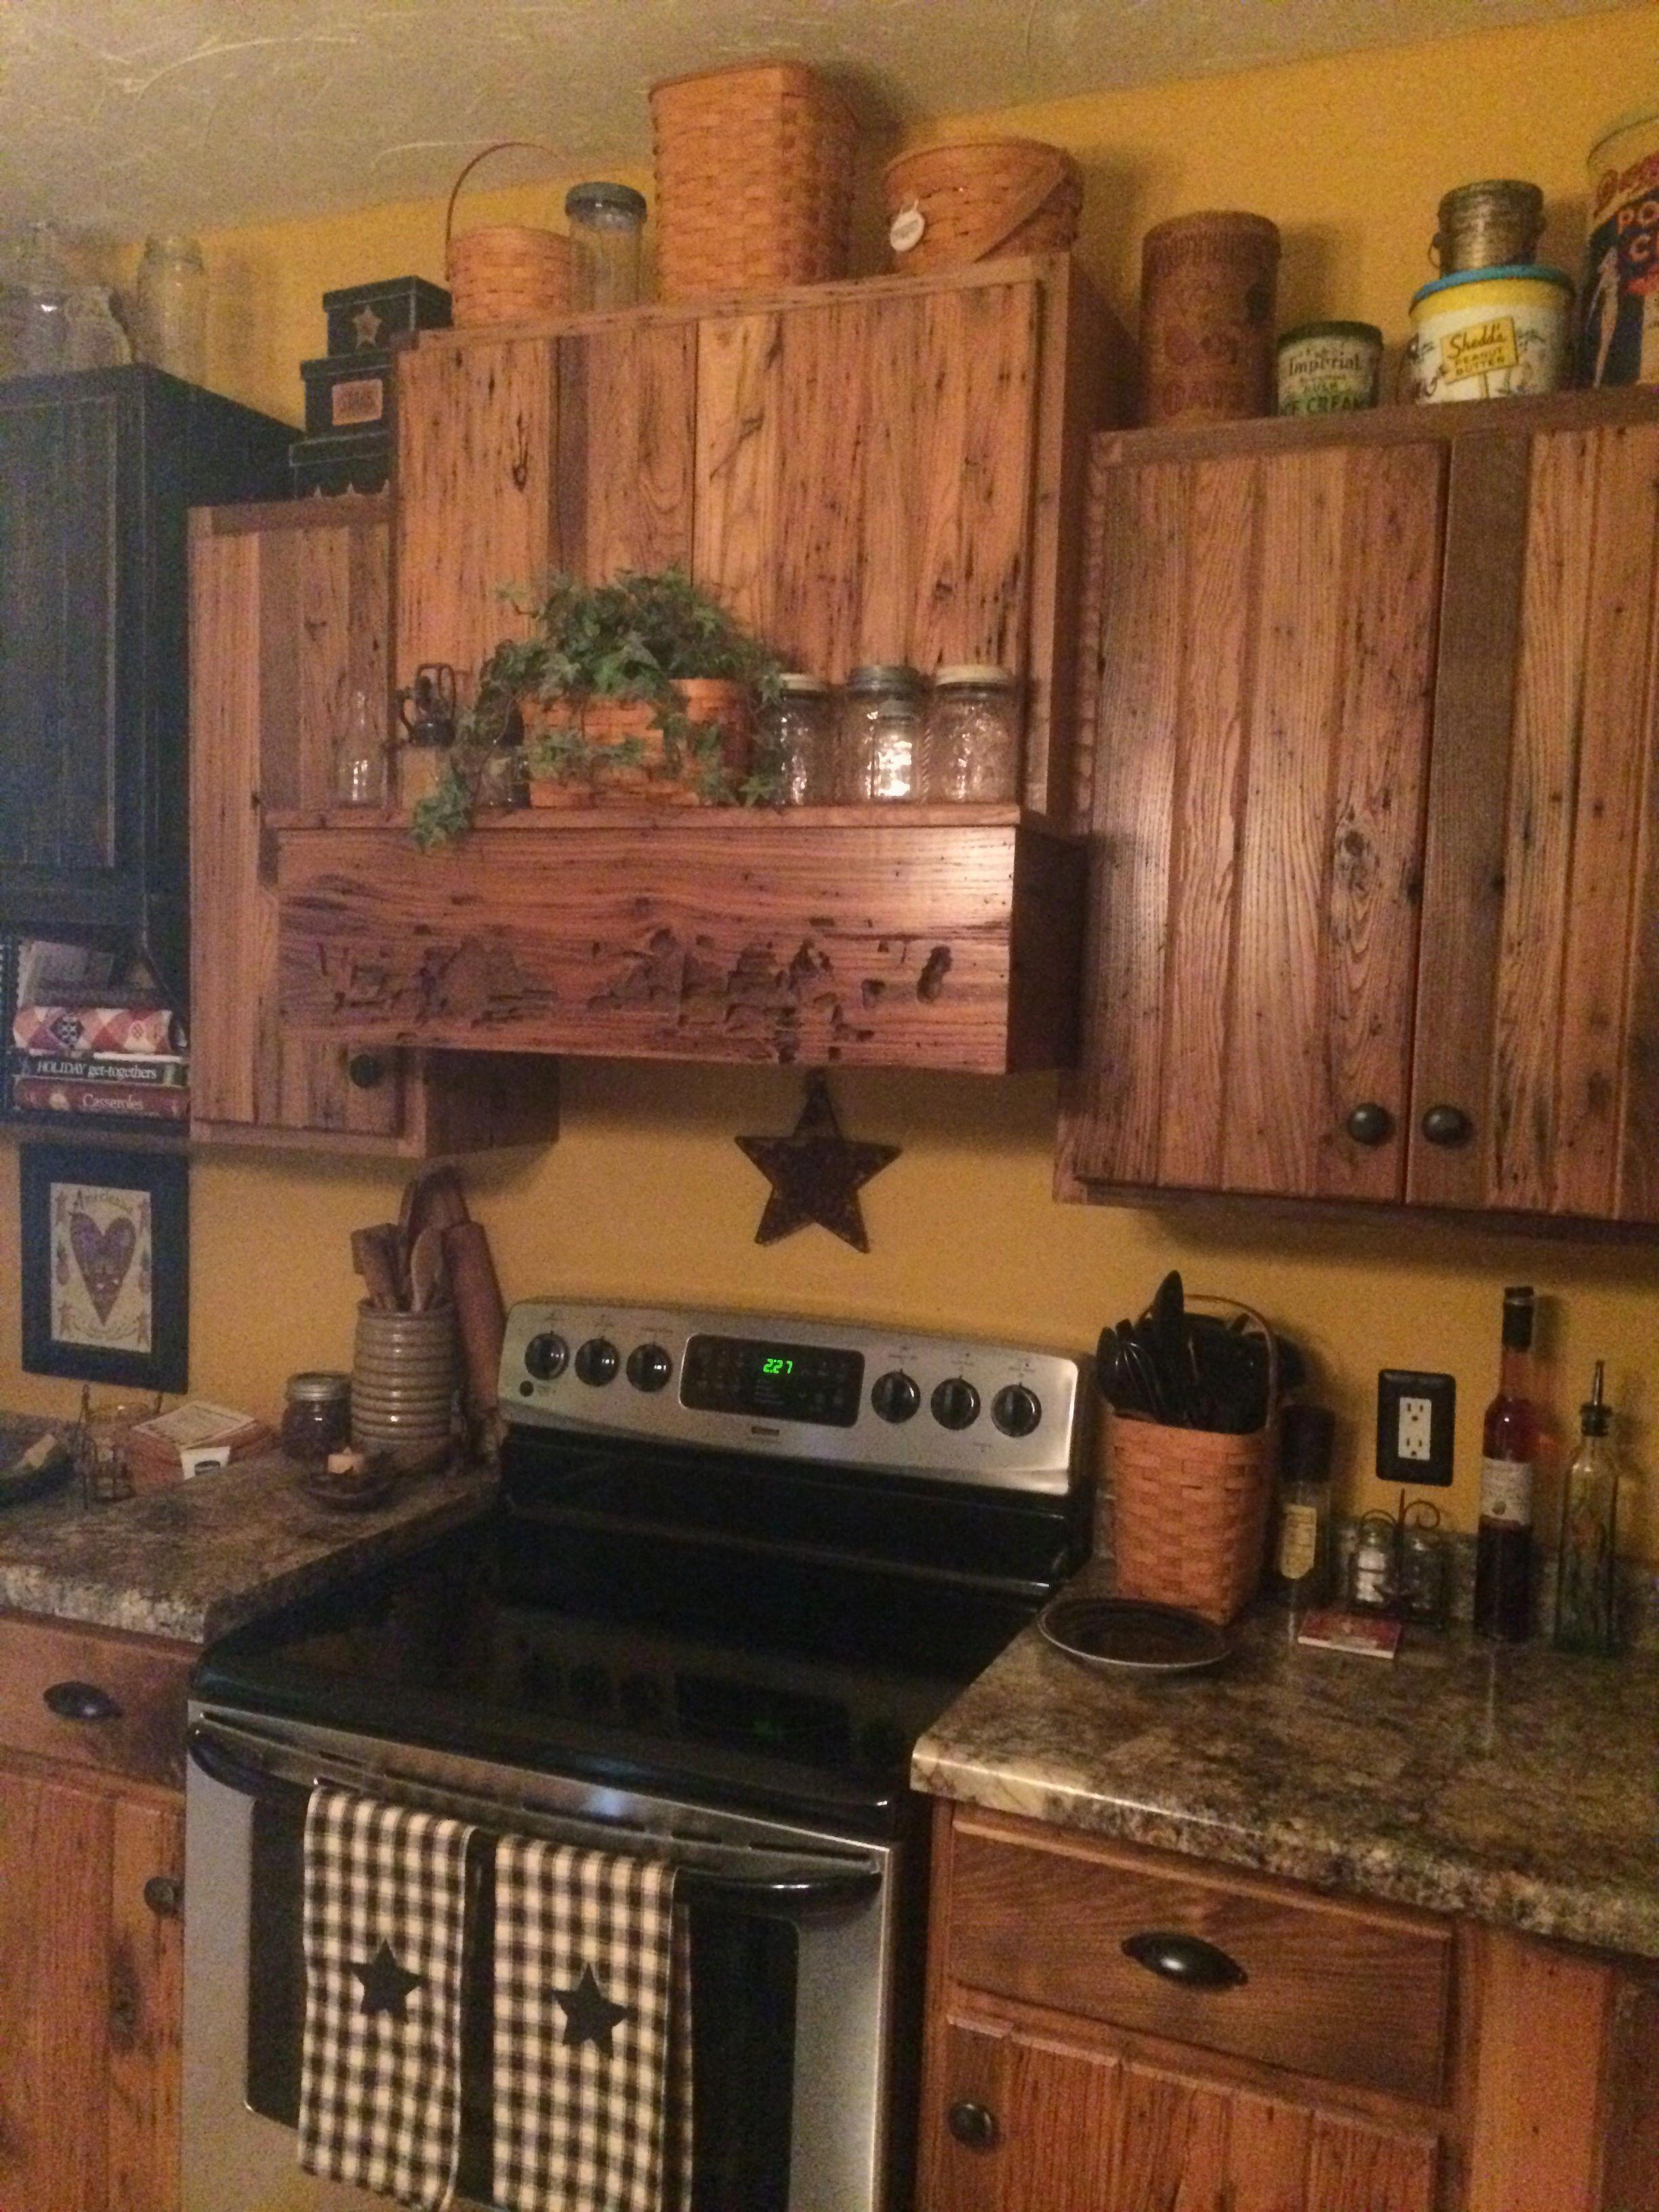 Wormy Chestnut Kitchen Designed By Me Worth All The Work Tuscankitchens Primitivekitc Primitive Kitchen Decor Primitive Kitchen Cabinets Primitive Kitchen